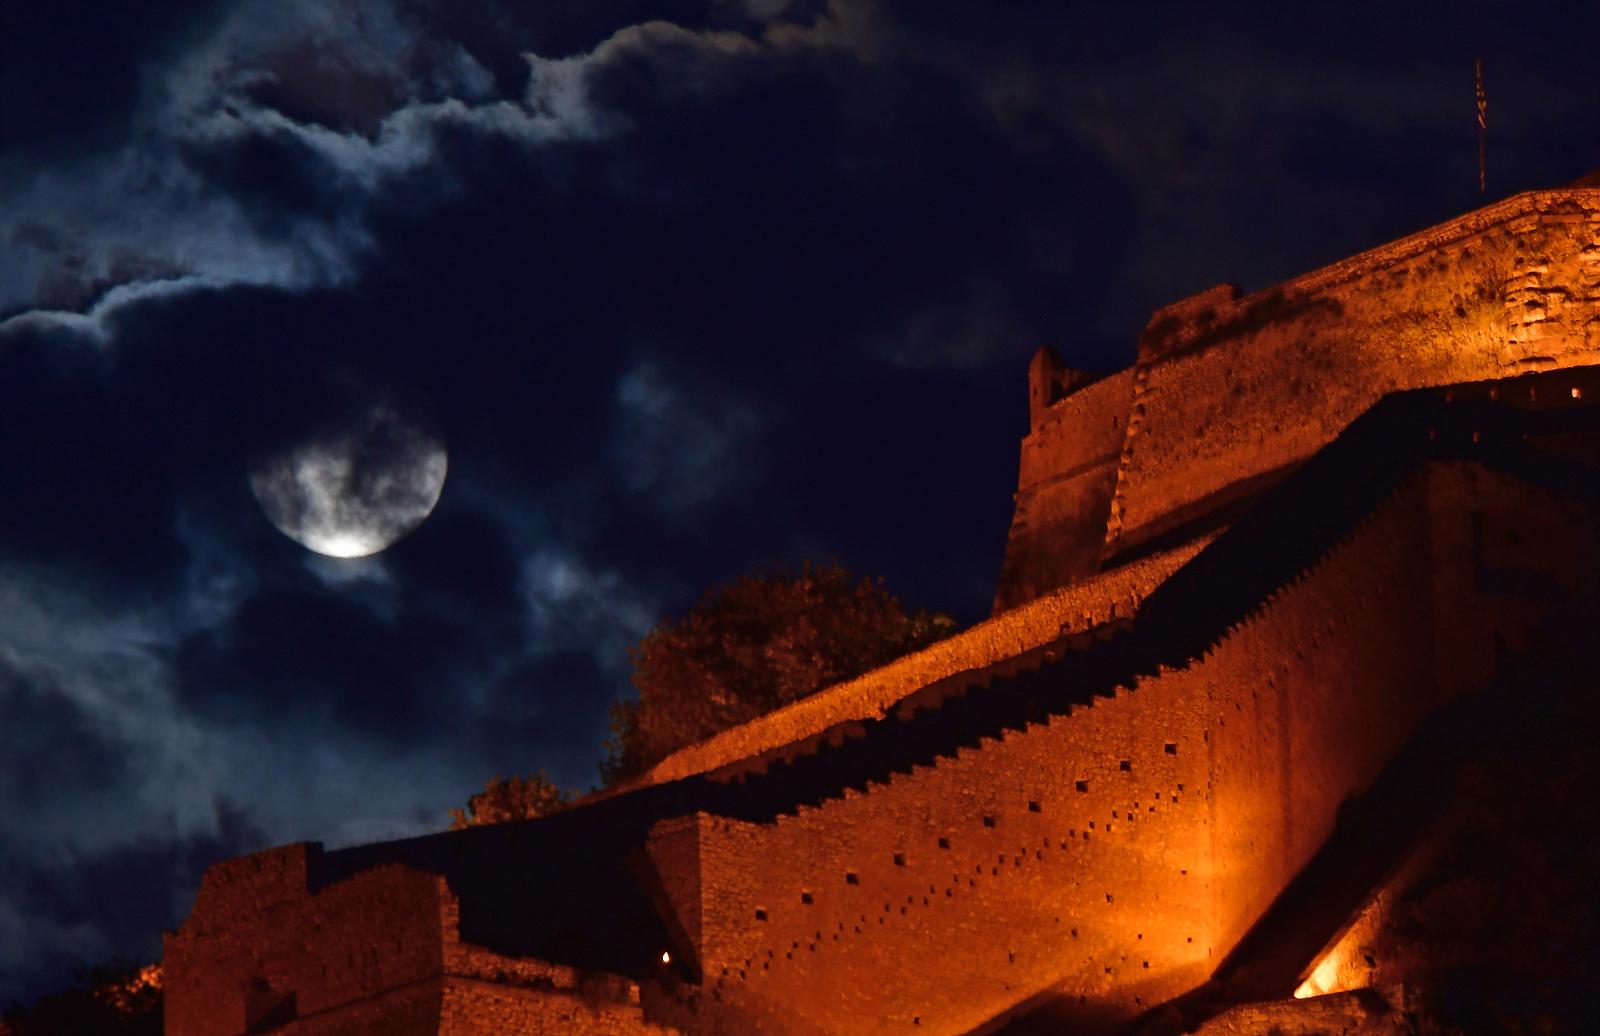 Full moon rising behind Palamidi castle in Nafplio, Greece 25 May 2021. EPA